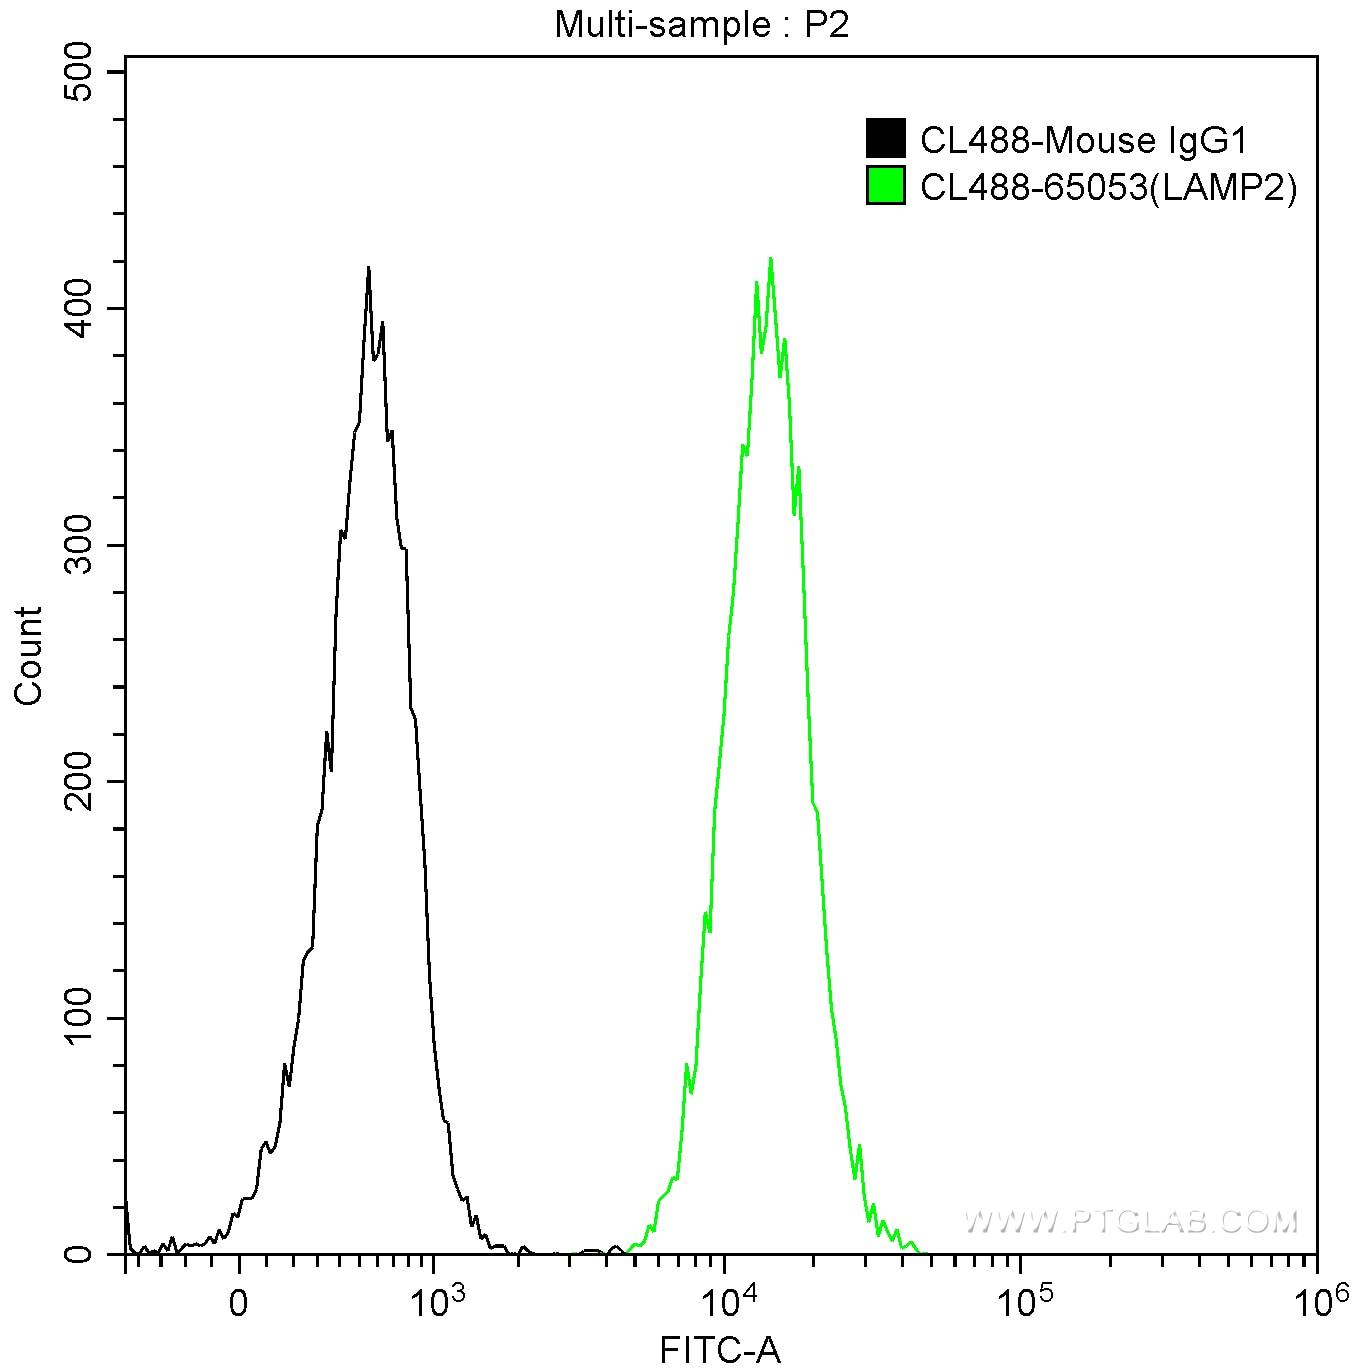 FC experiment of Jurkat using CL488-65053